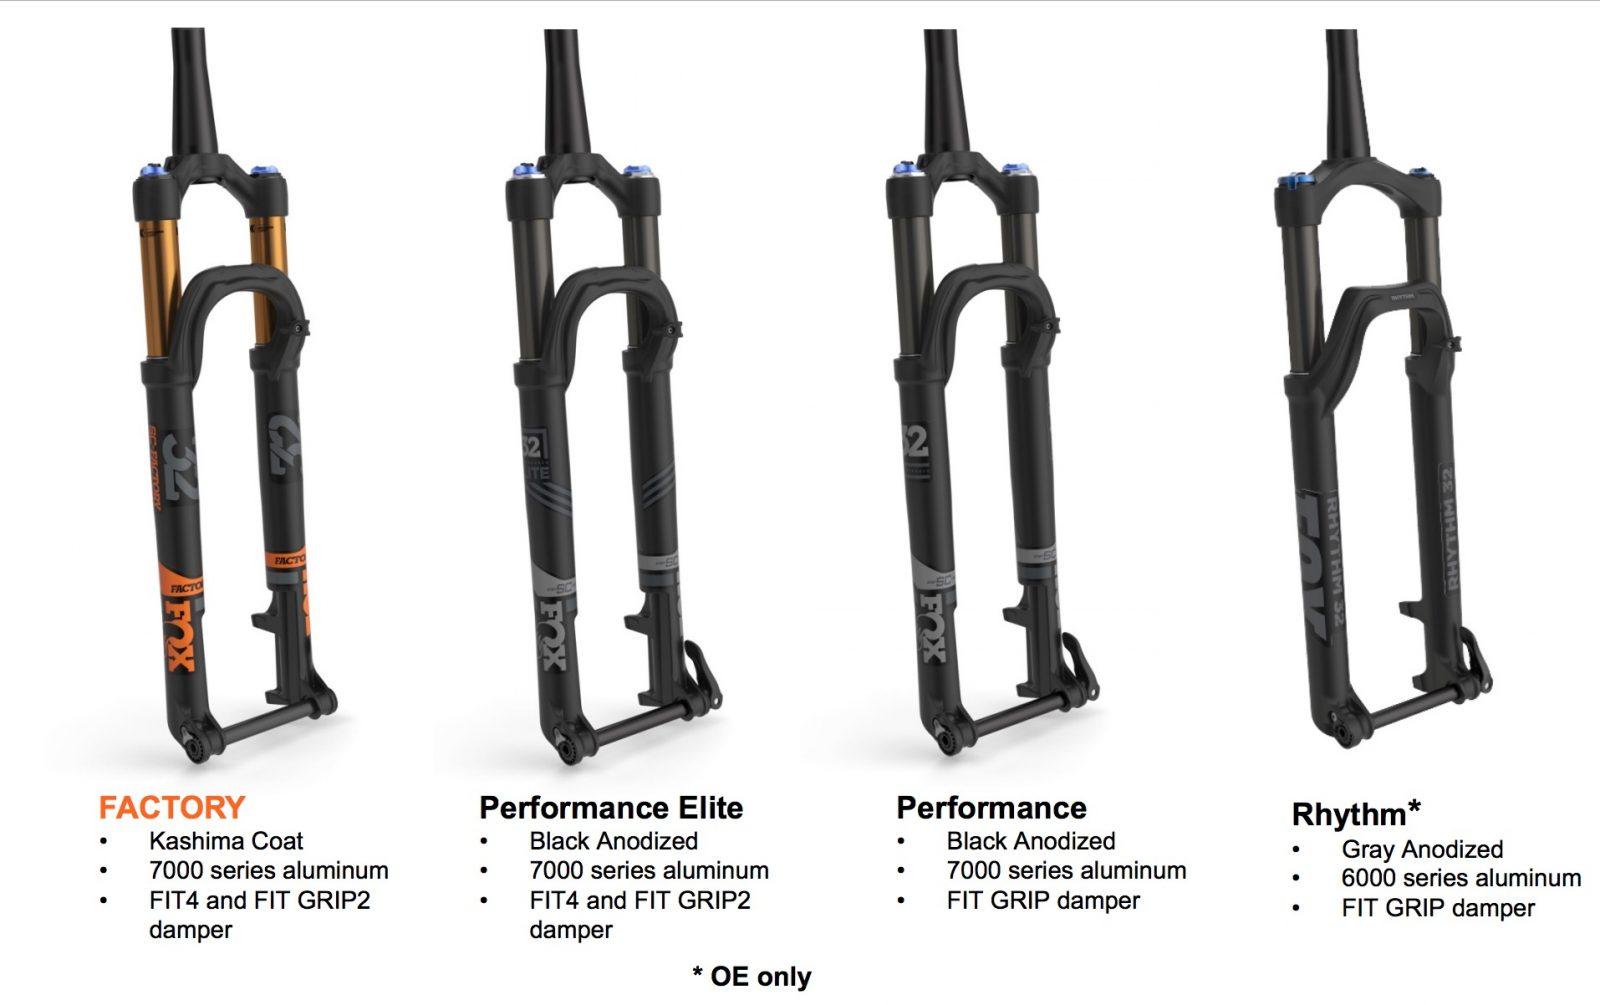 MTB-MAG COM - Mountain Bike Magazine   [Tested] New Fox 36 Grip2